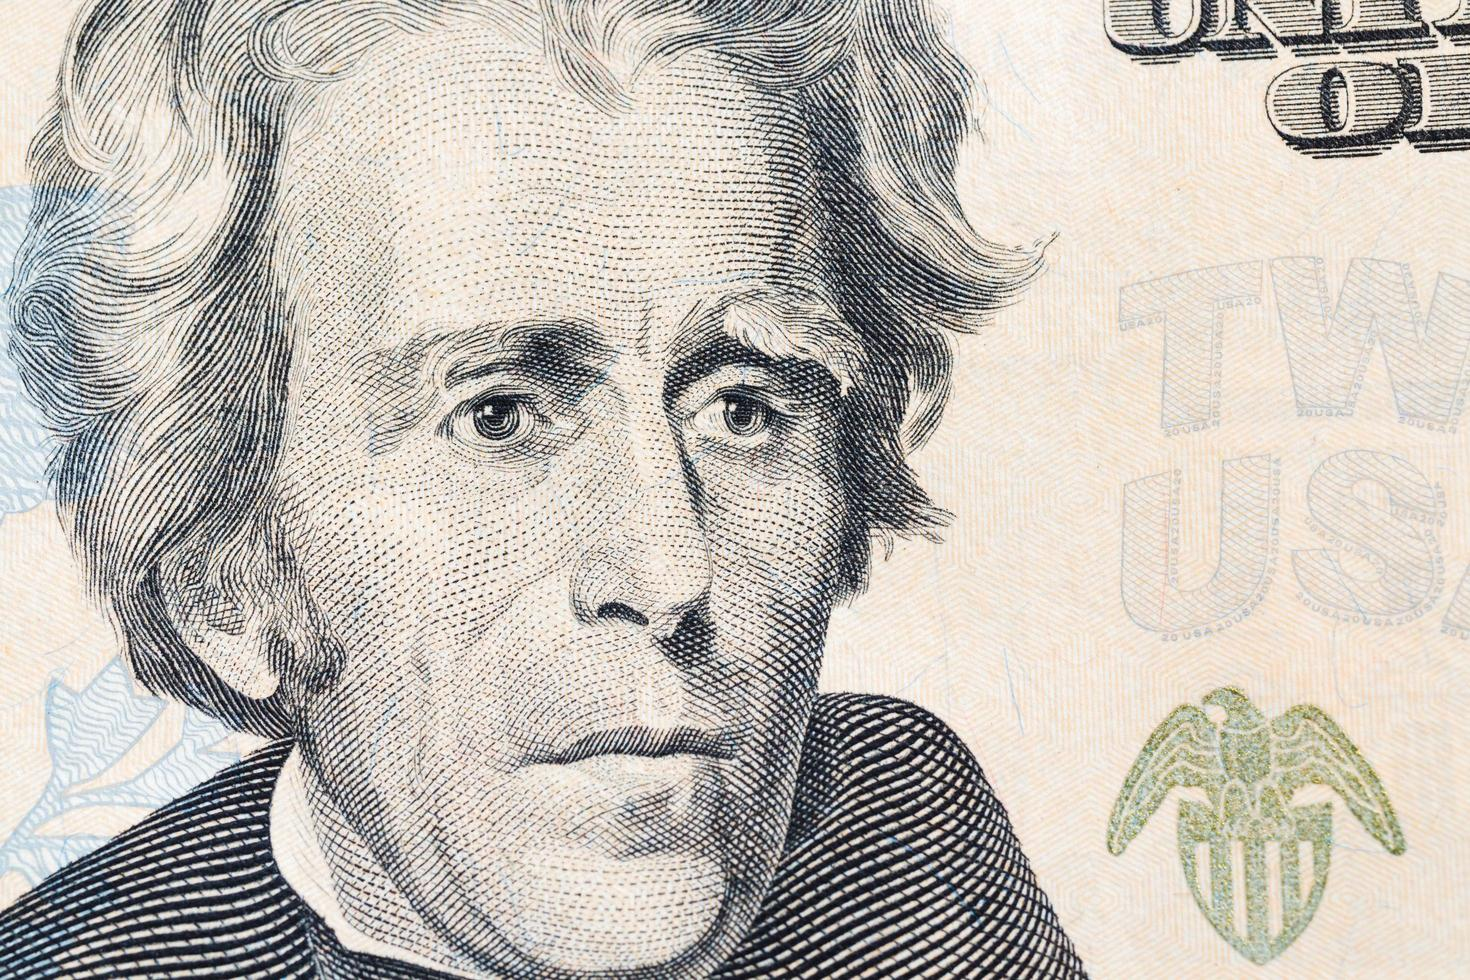 Amerikaanse dollarsbankbiljetten, commercieel en bancair concept foto